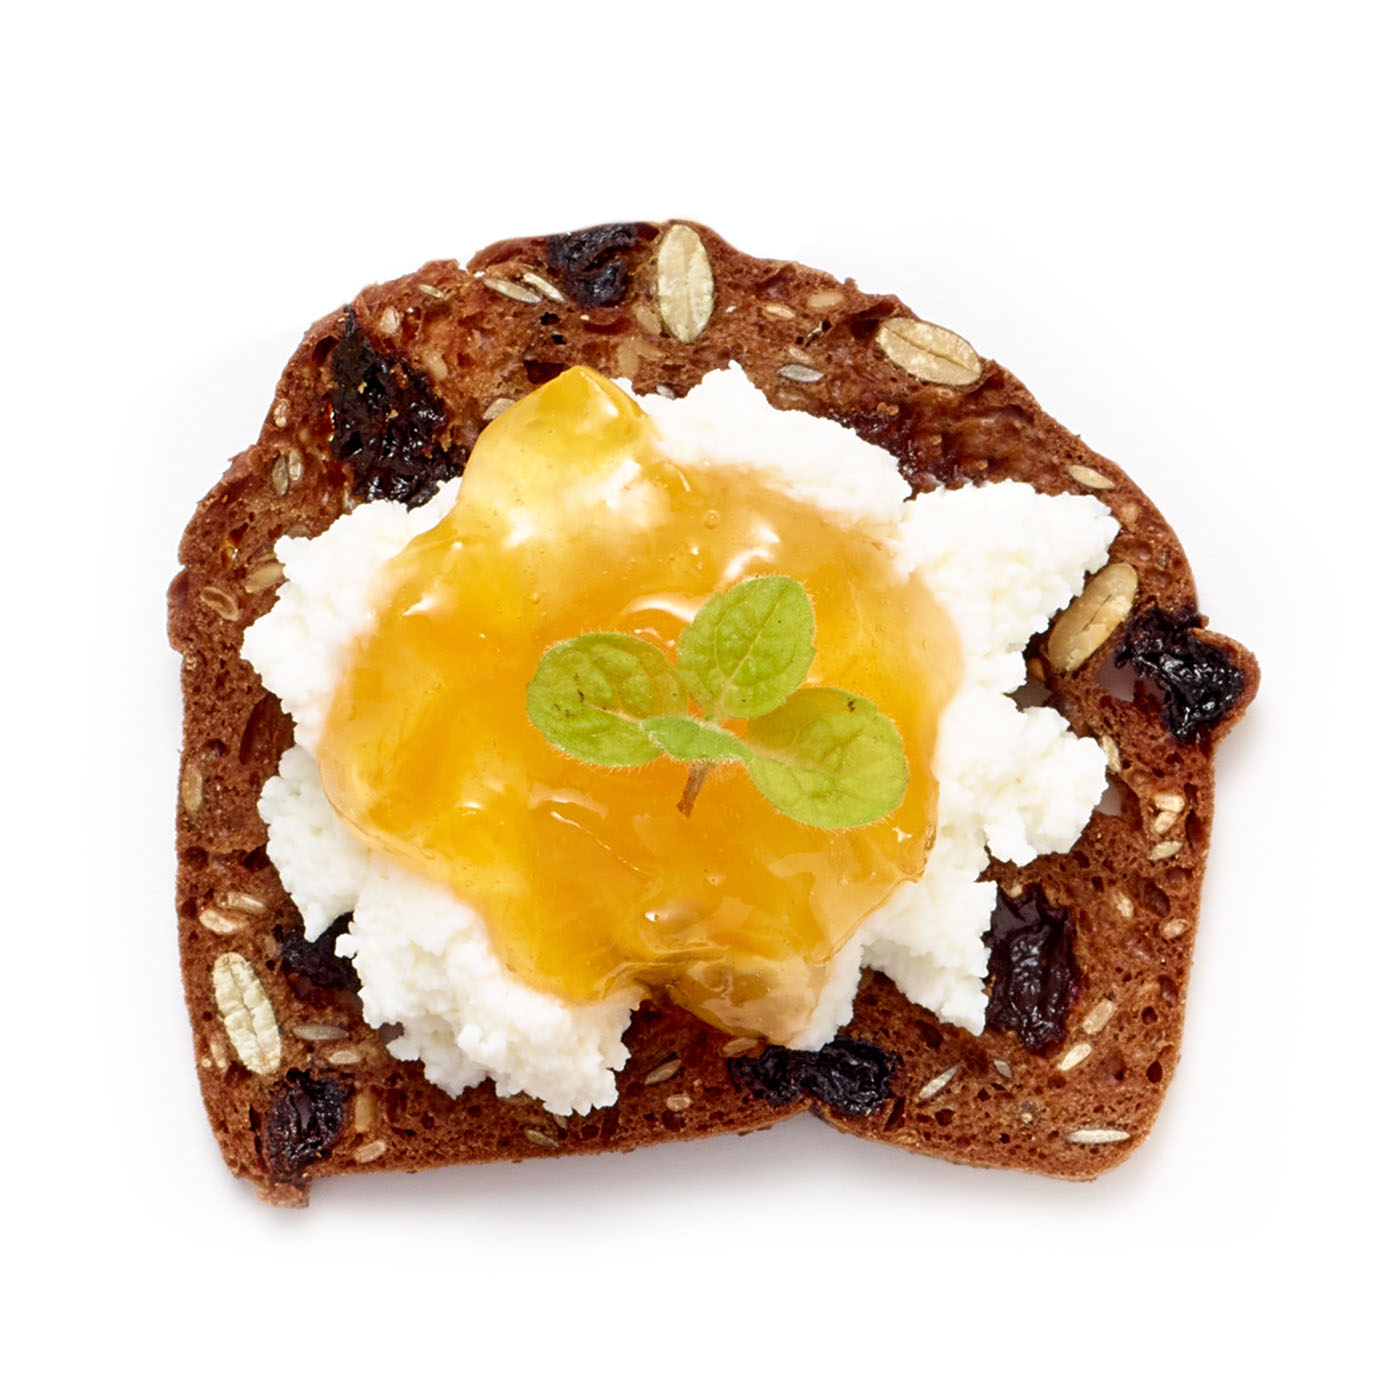 lesley stowe raincoast crisps® Apricot, Fig and Lemon